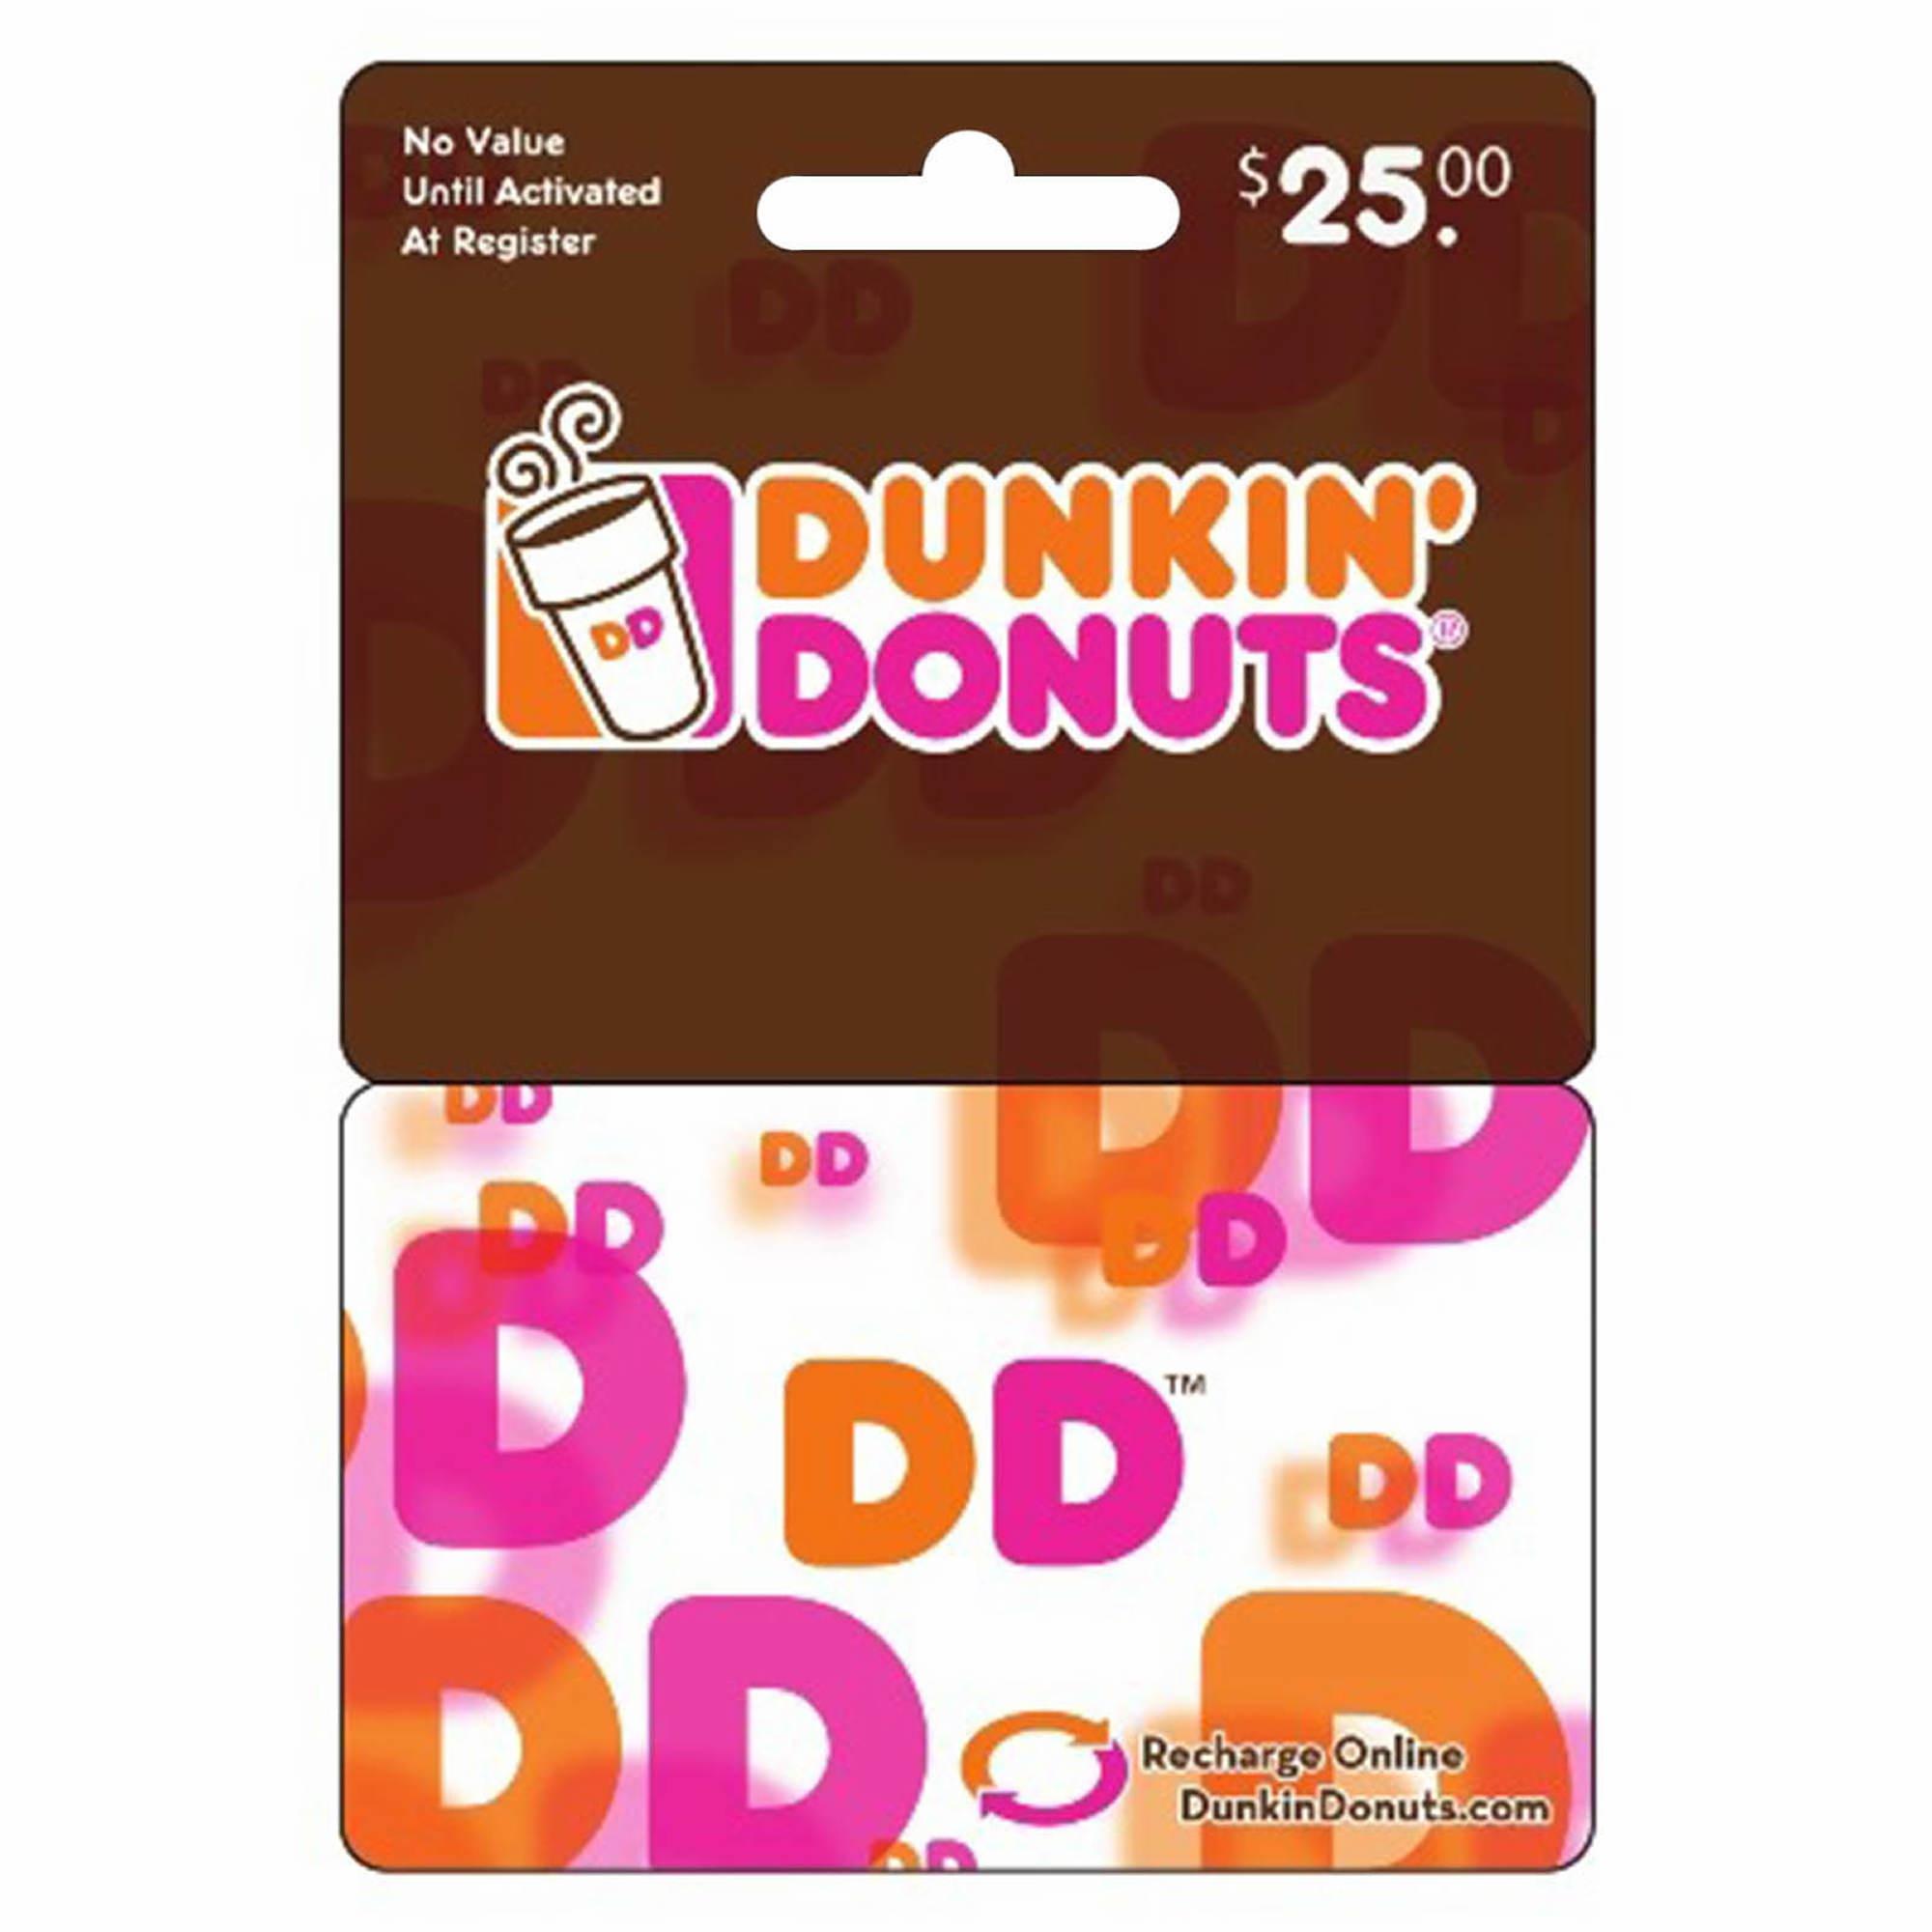 Dunkin Donuts DD Card BJs Wholesale Club - Dunkin donuts location map usa